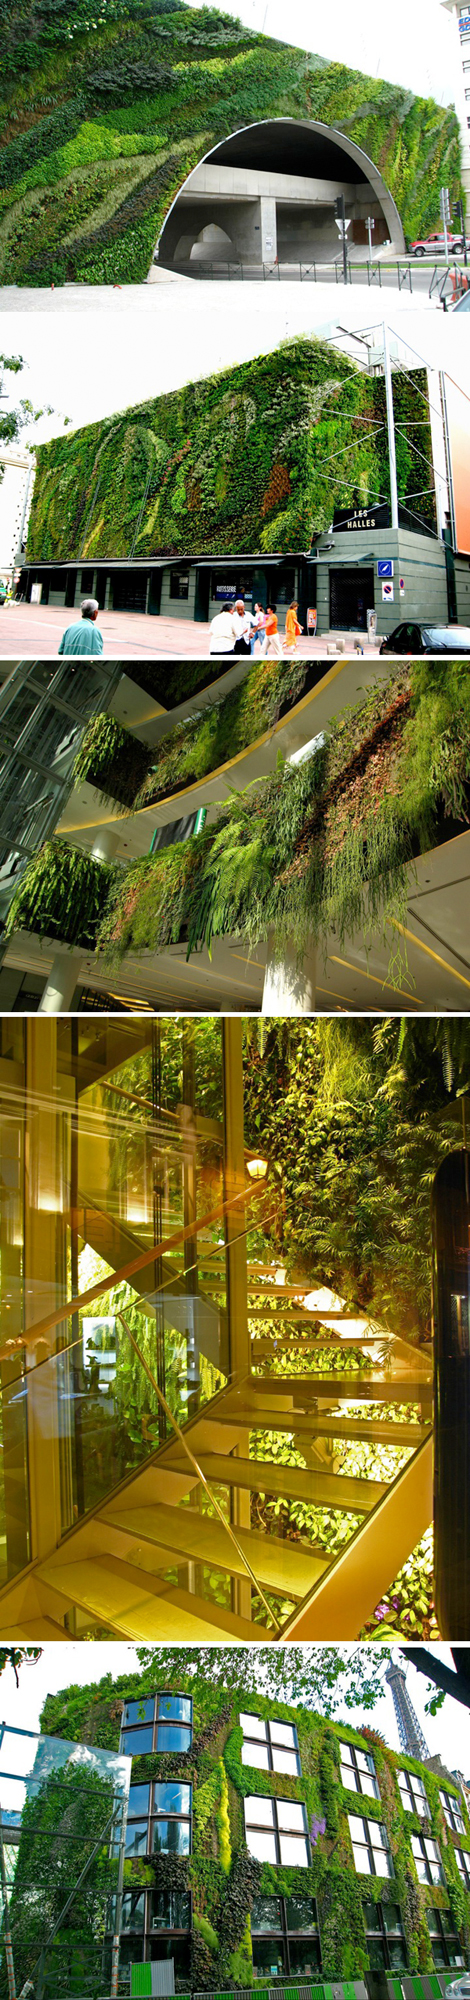 Vertgardens